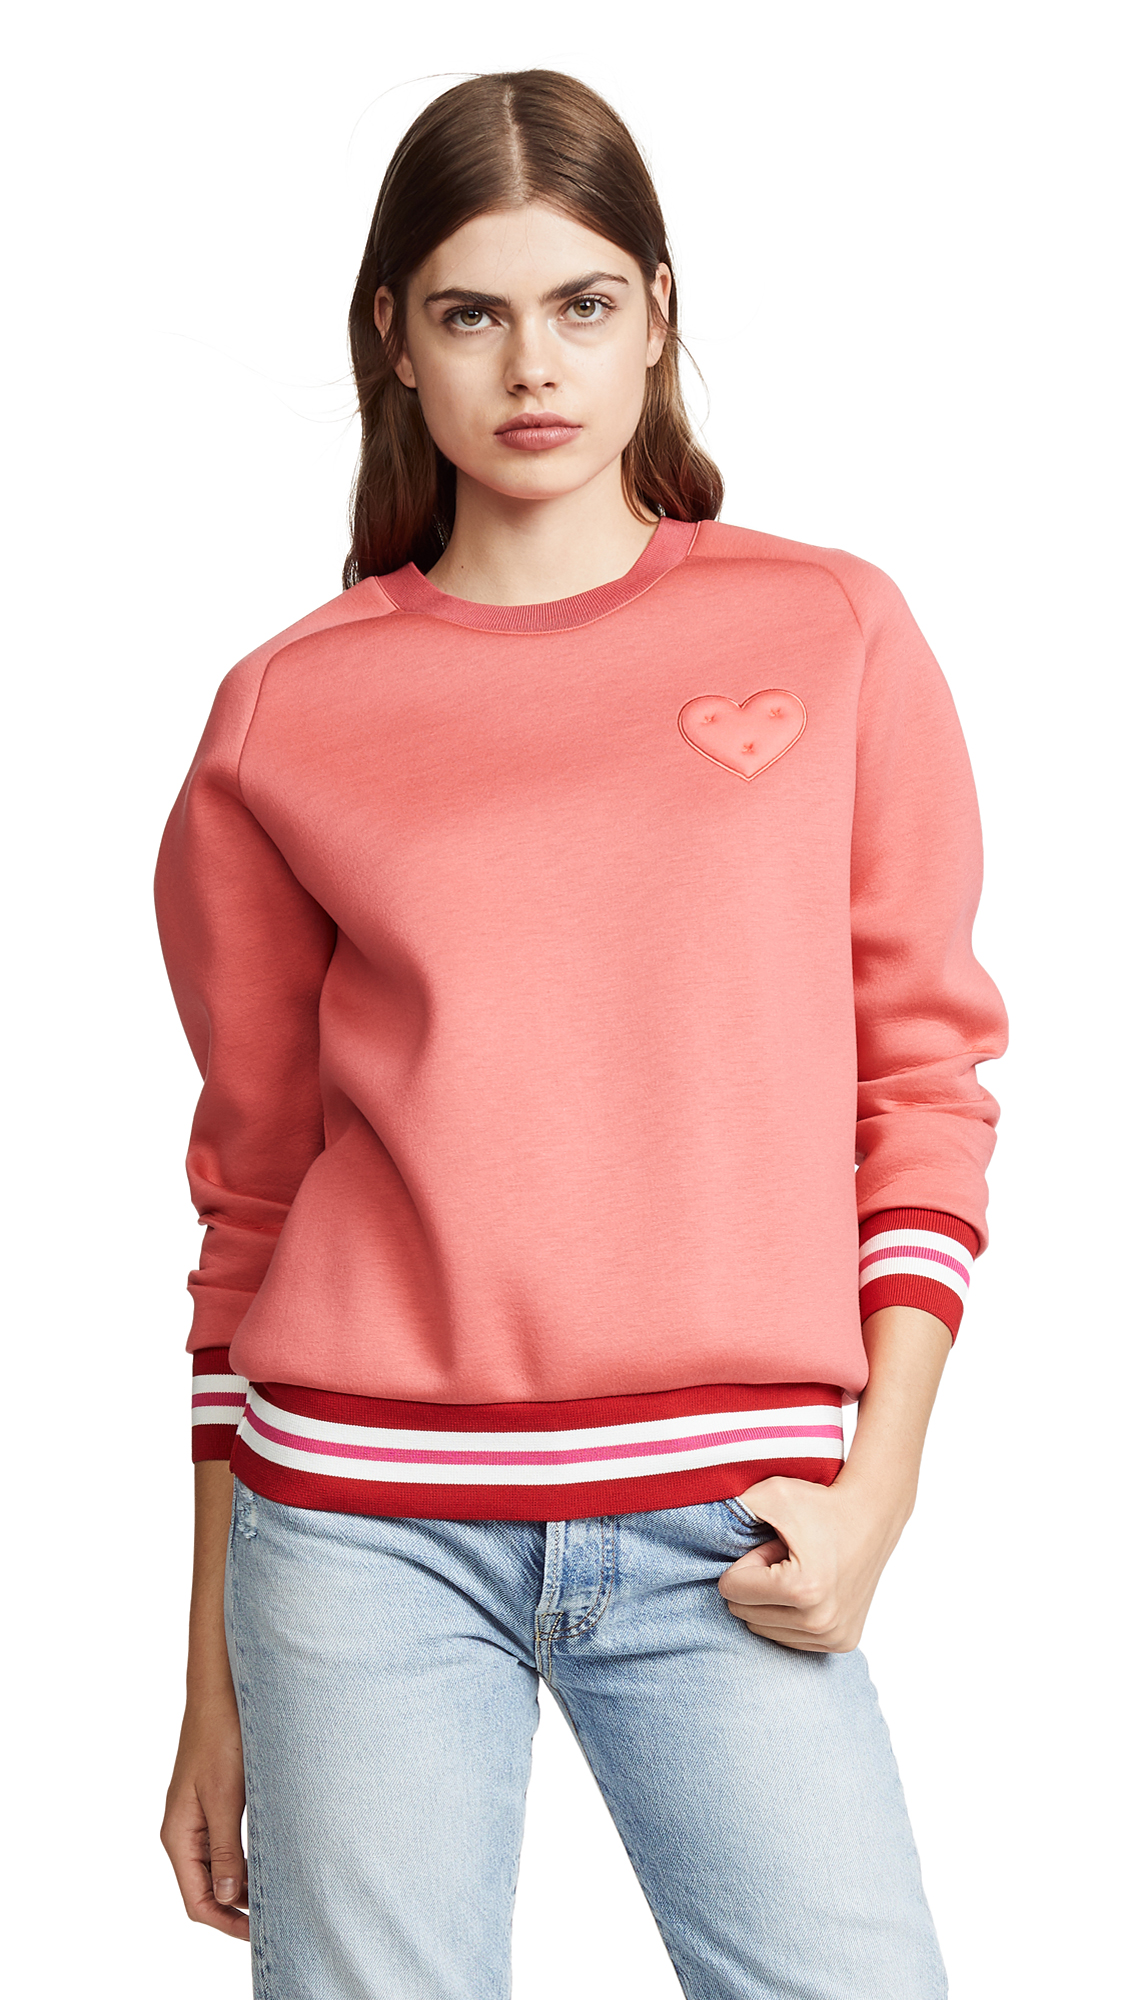 Anya Hindmarch Chubby Heart Sweatshirt In Red